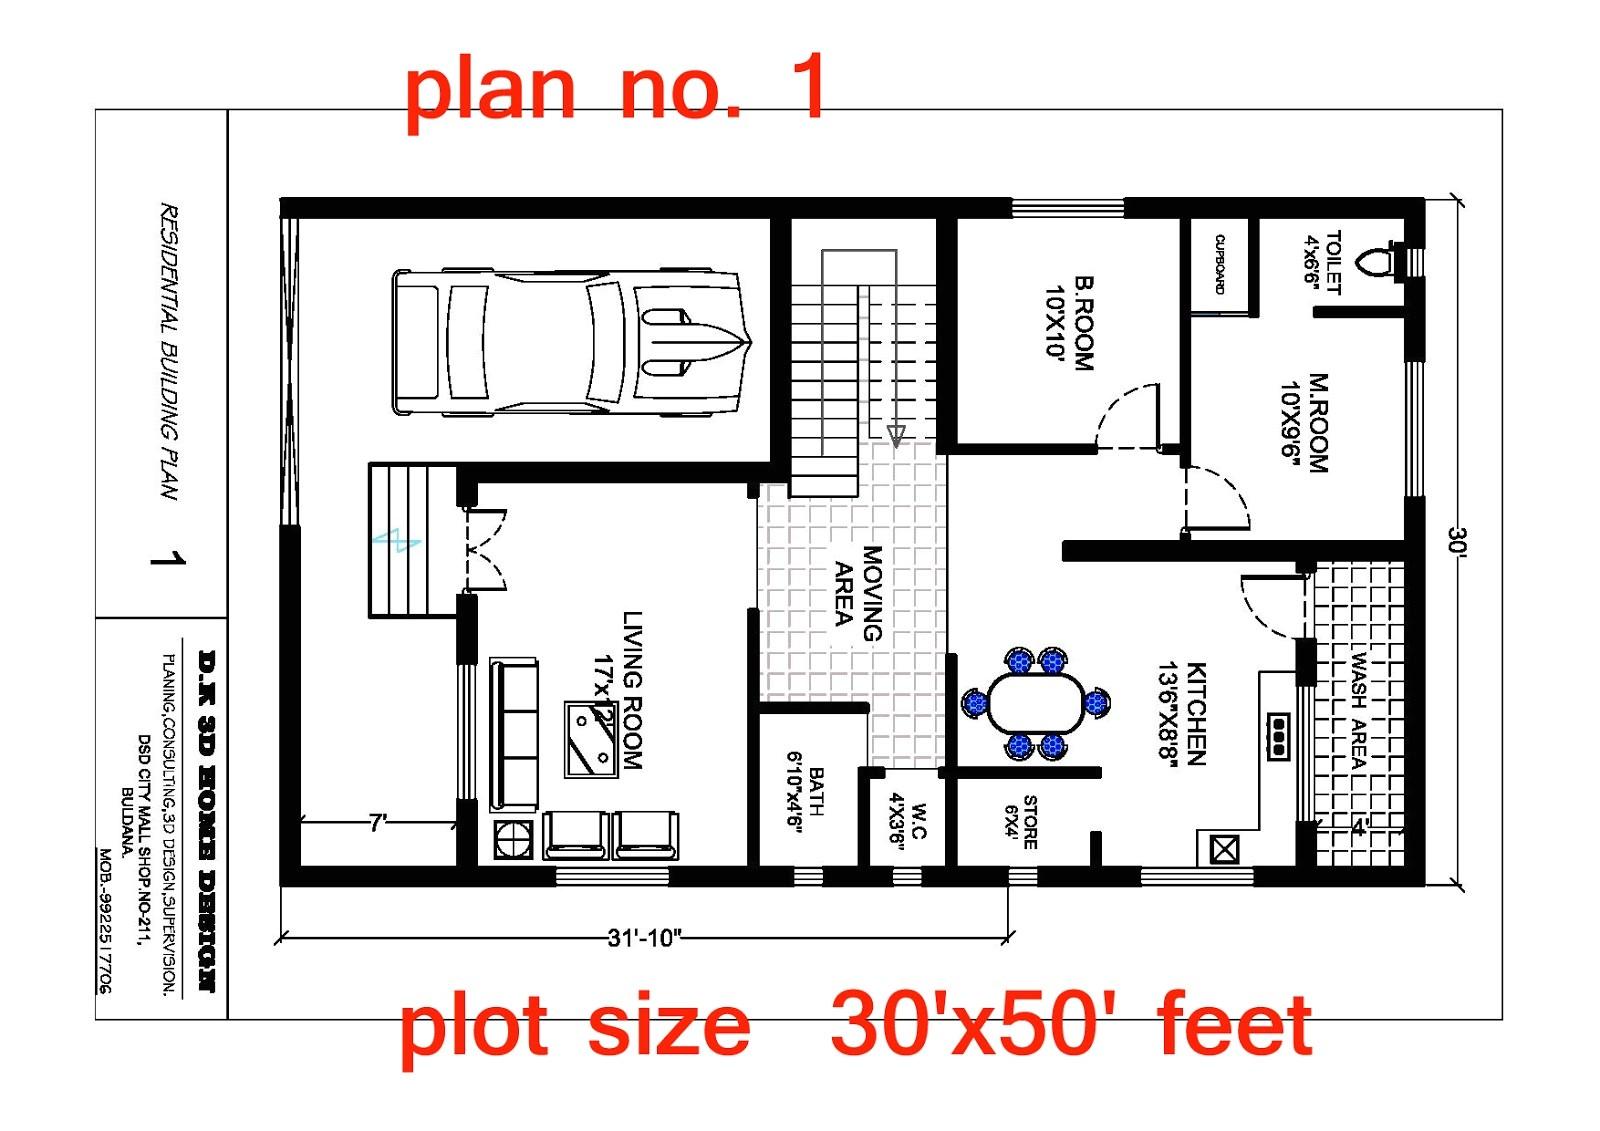 30 feet by 50 feet home plan everyone will like